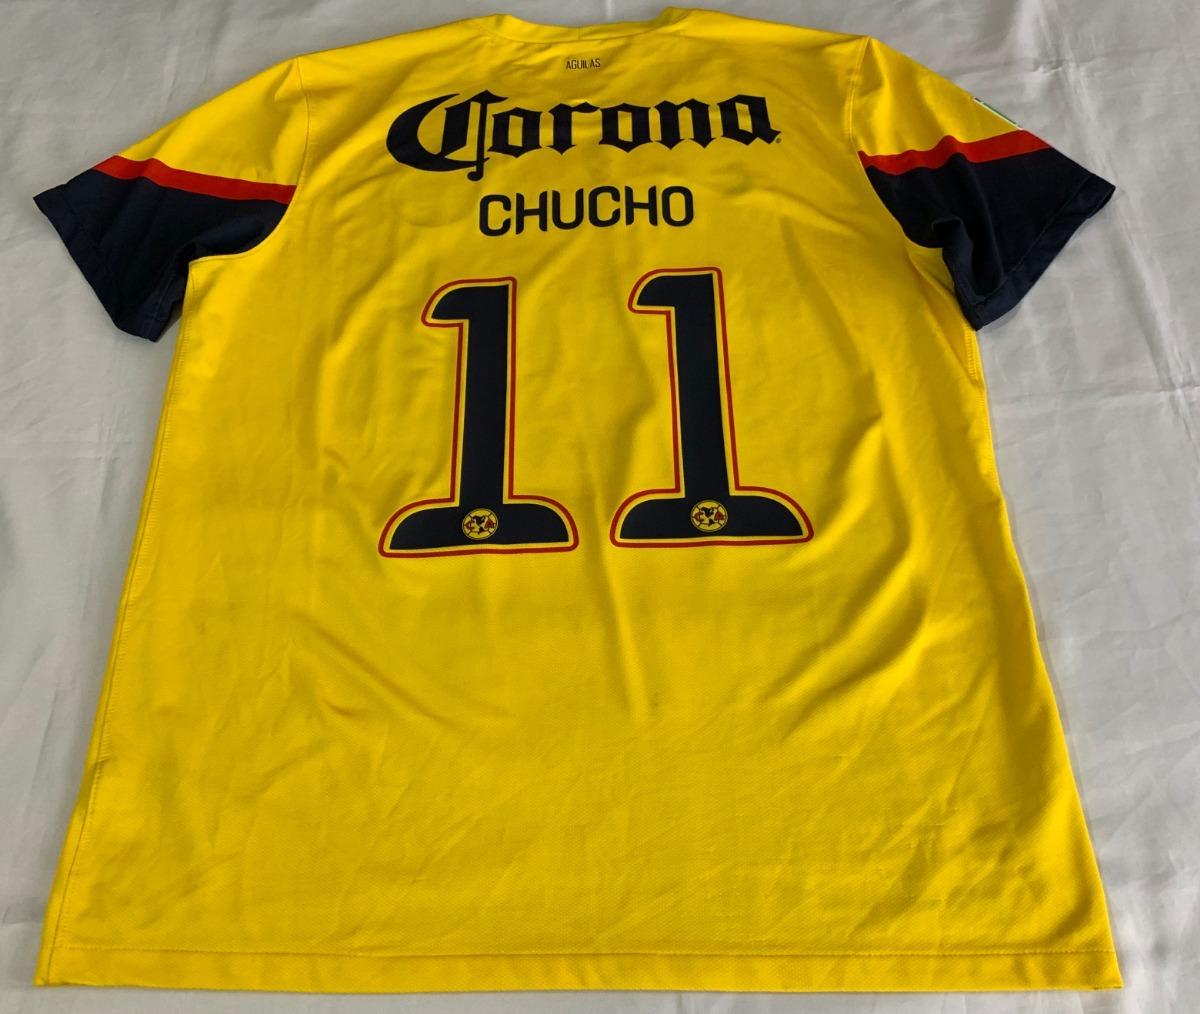 online store cb3c5 a7ebf Jersey Club America Nike Chucho Benitez - $ 799.00